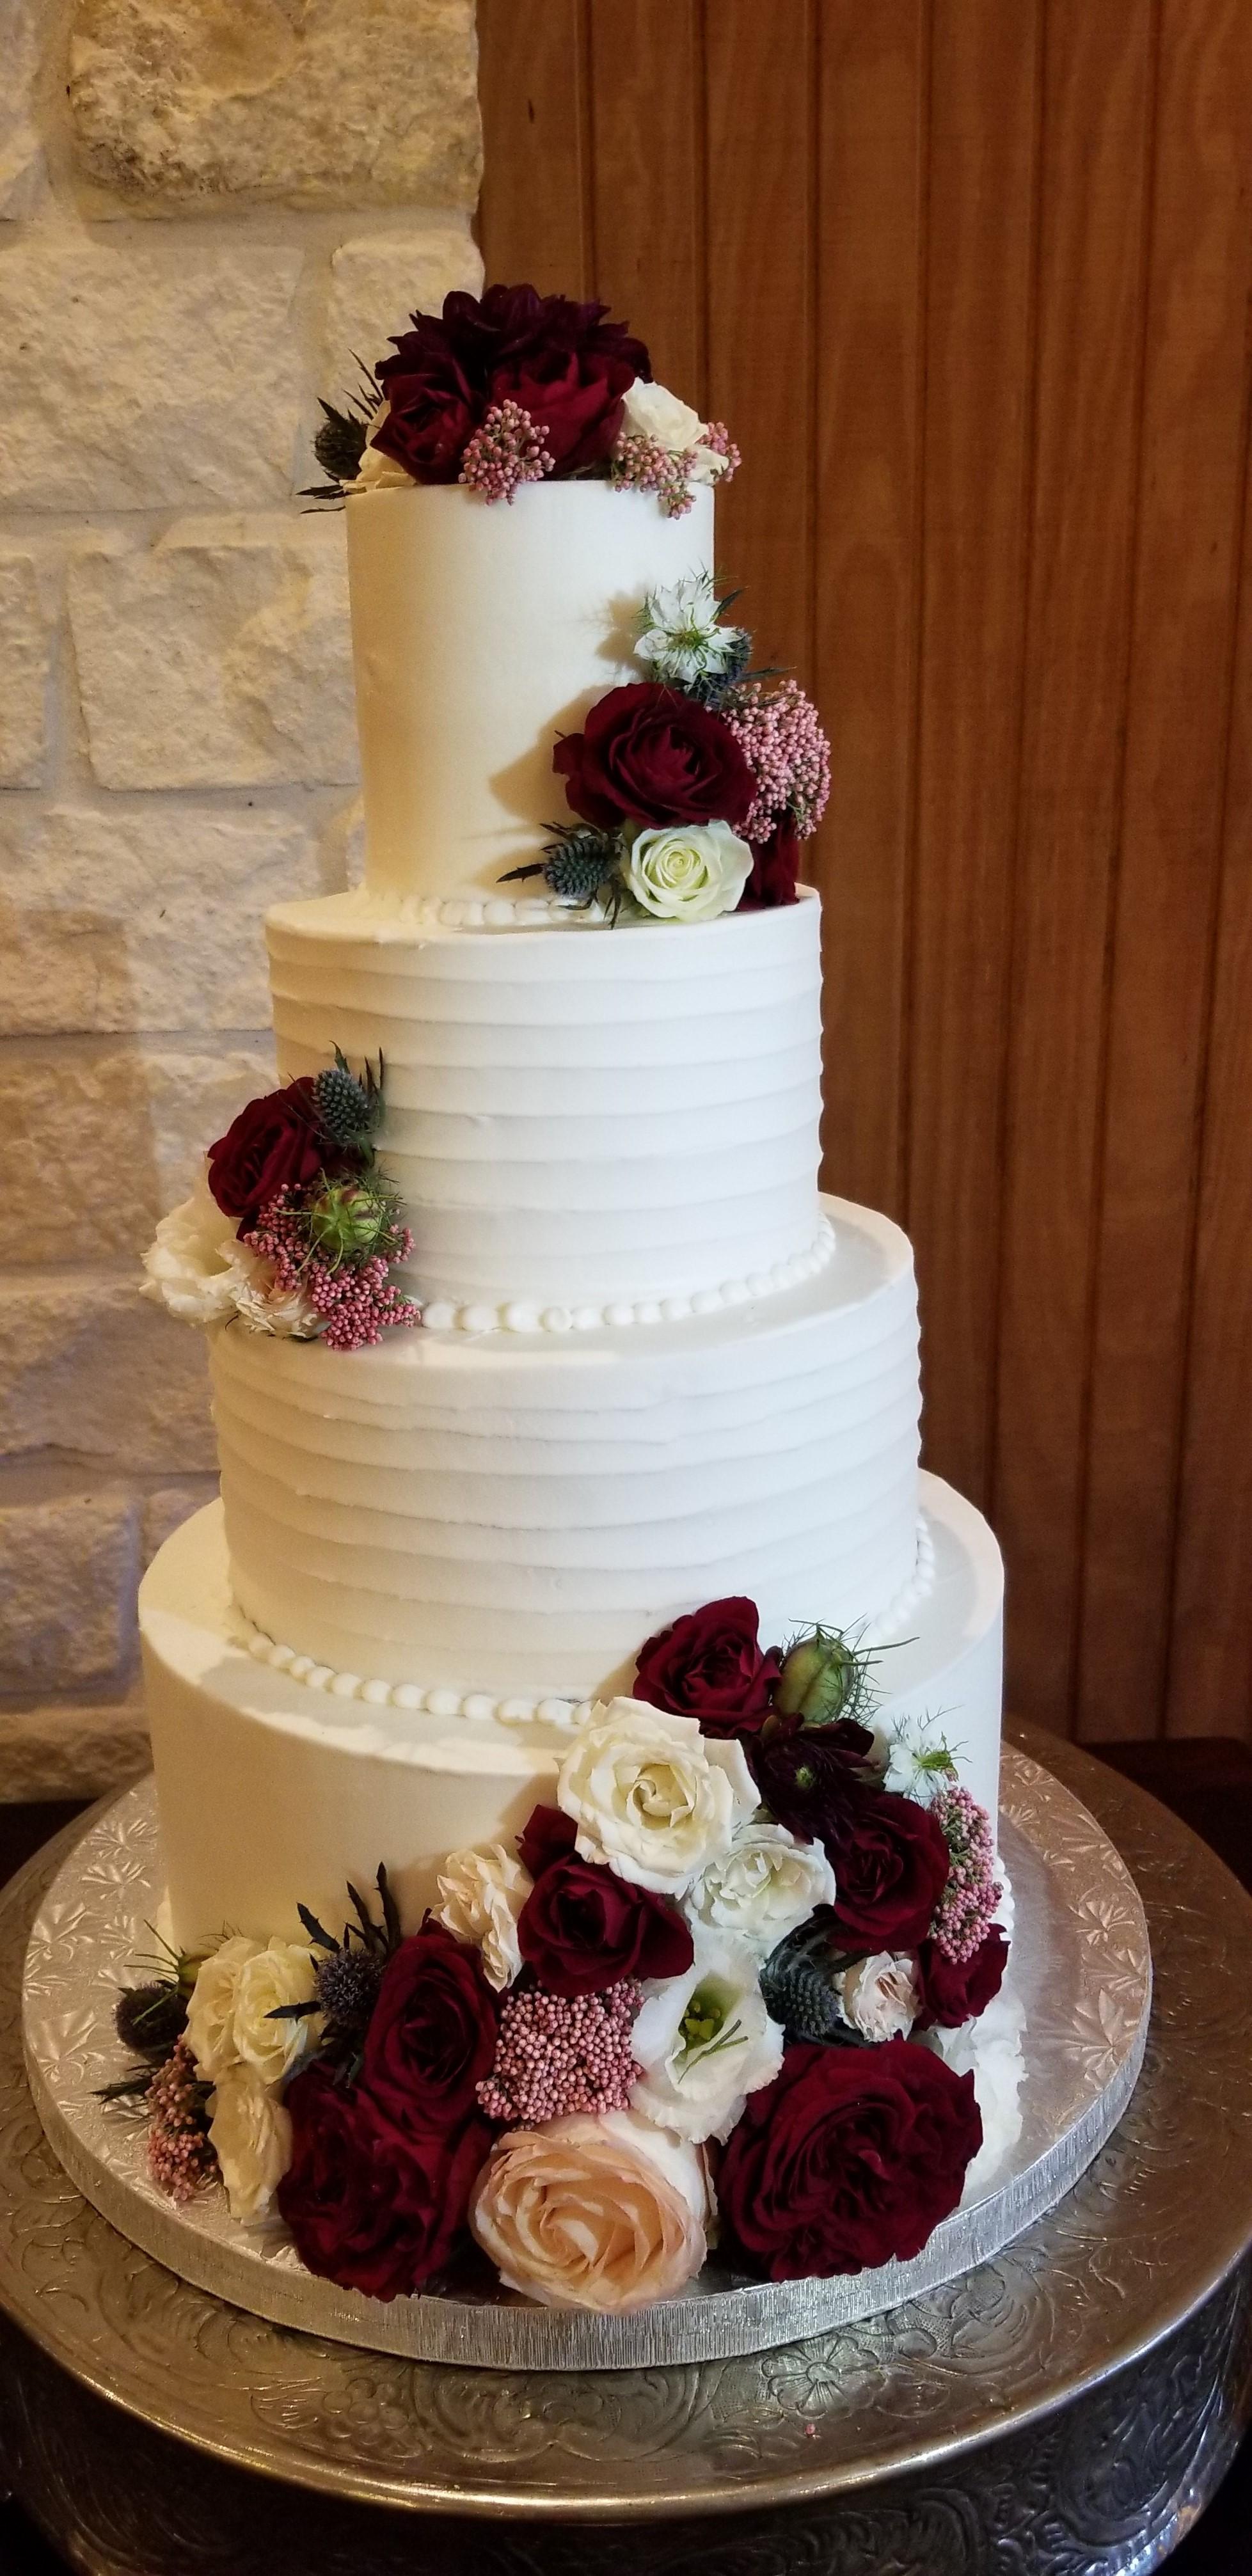 Wedding Cakes by Tammy Allen image 20